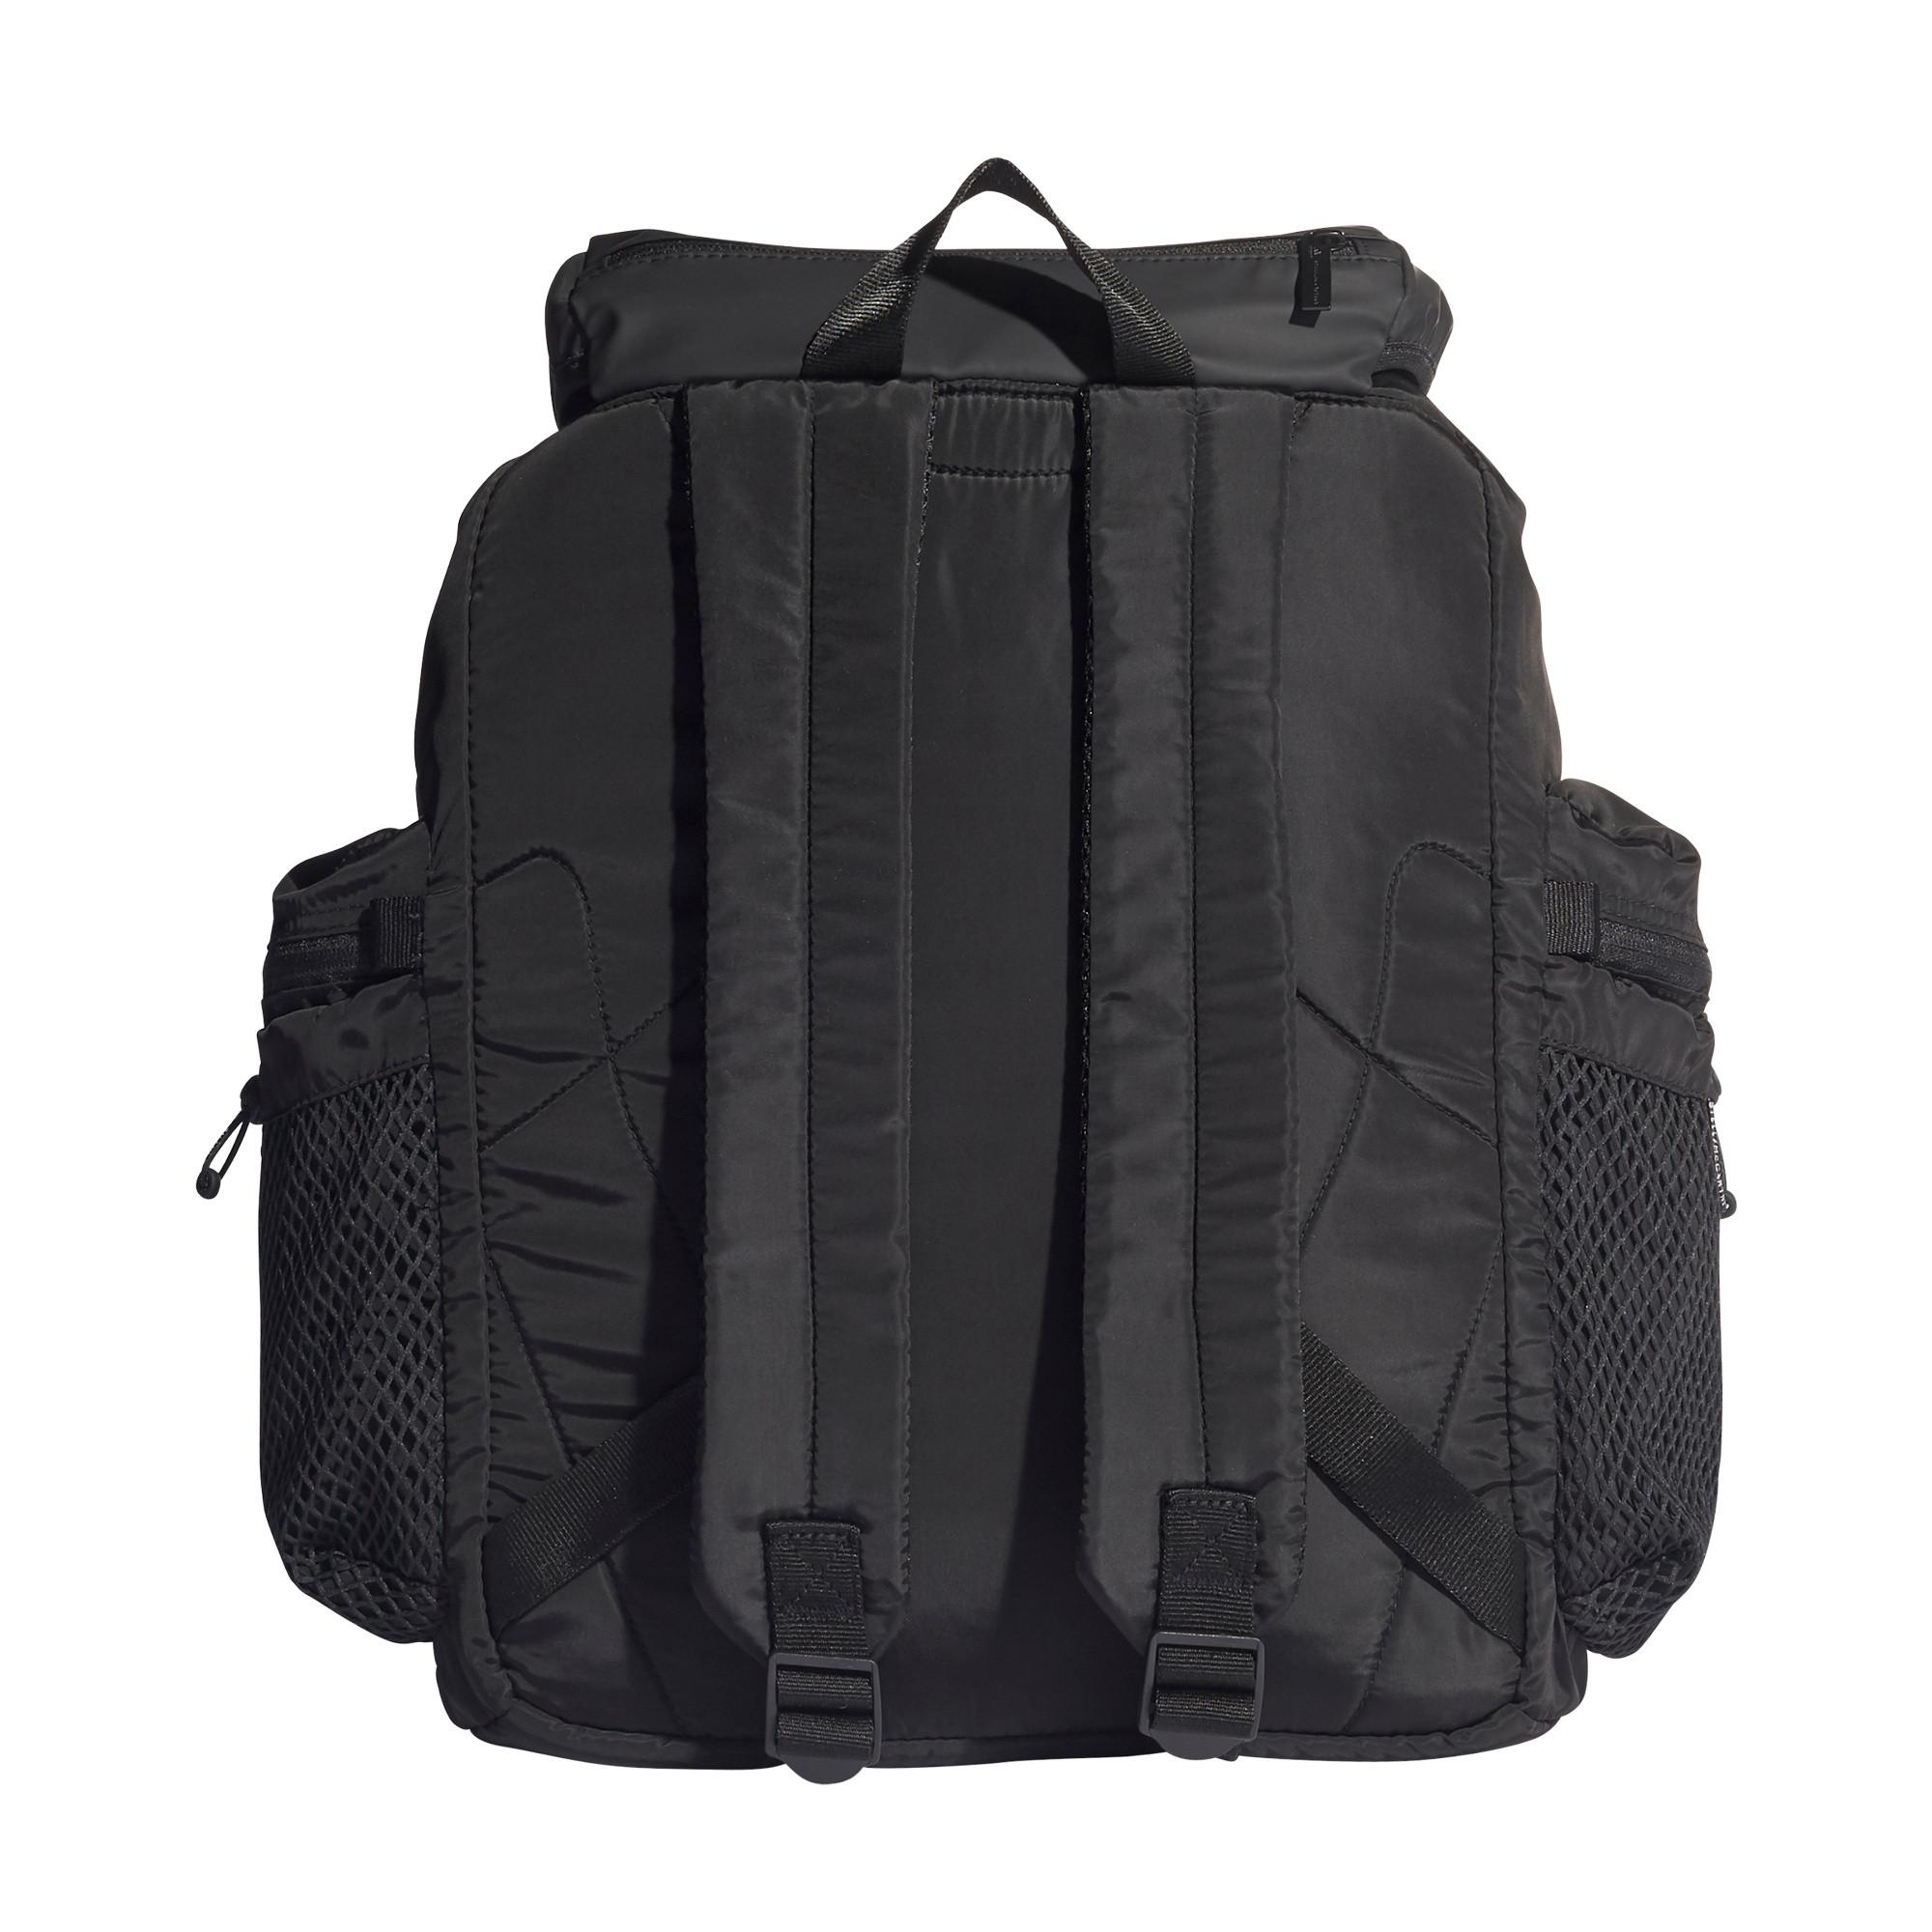 Zaino Asmc Backpack, Nero, large image number 2